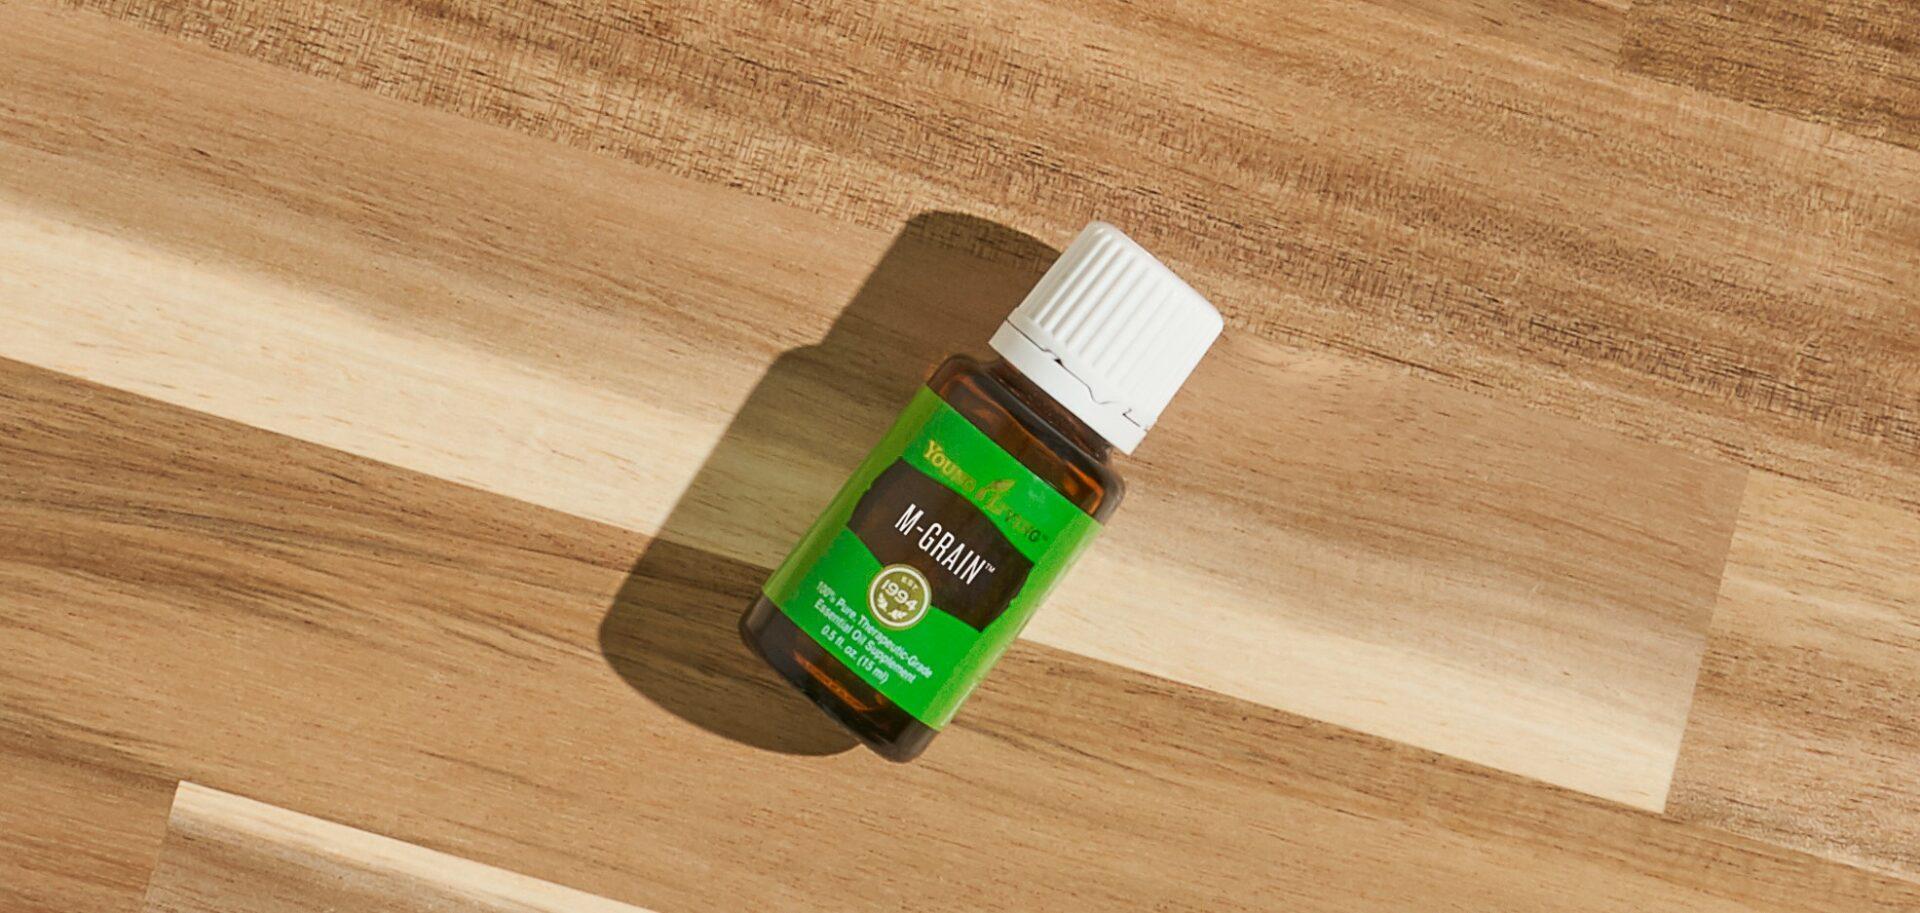 M-Grain Essential Oil Blend - Young Living Essential Oils